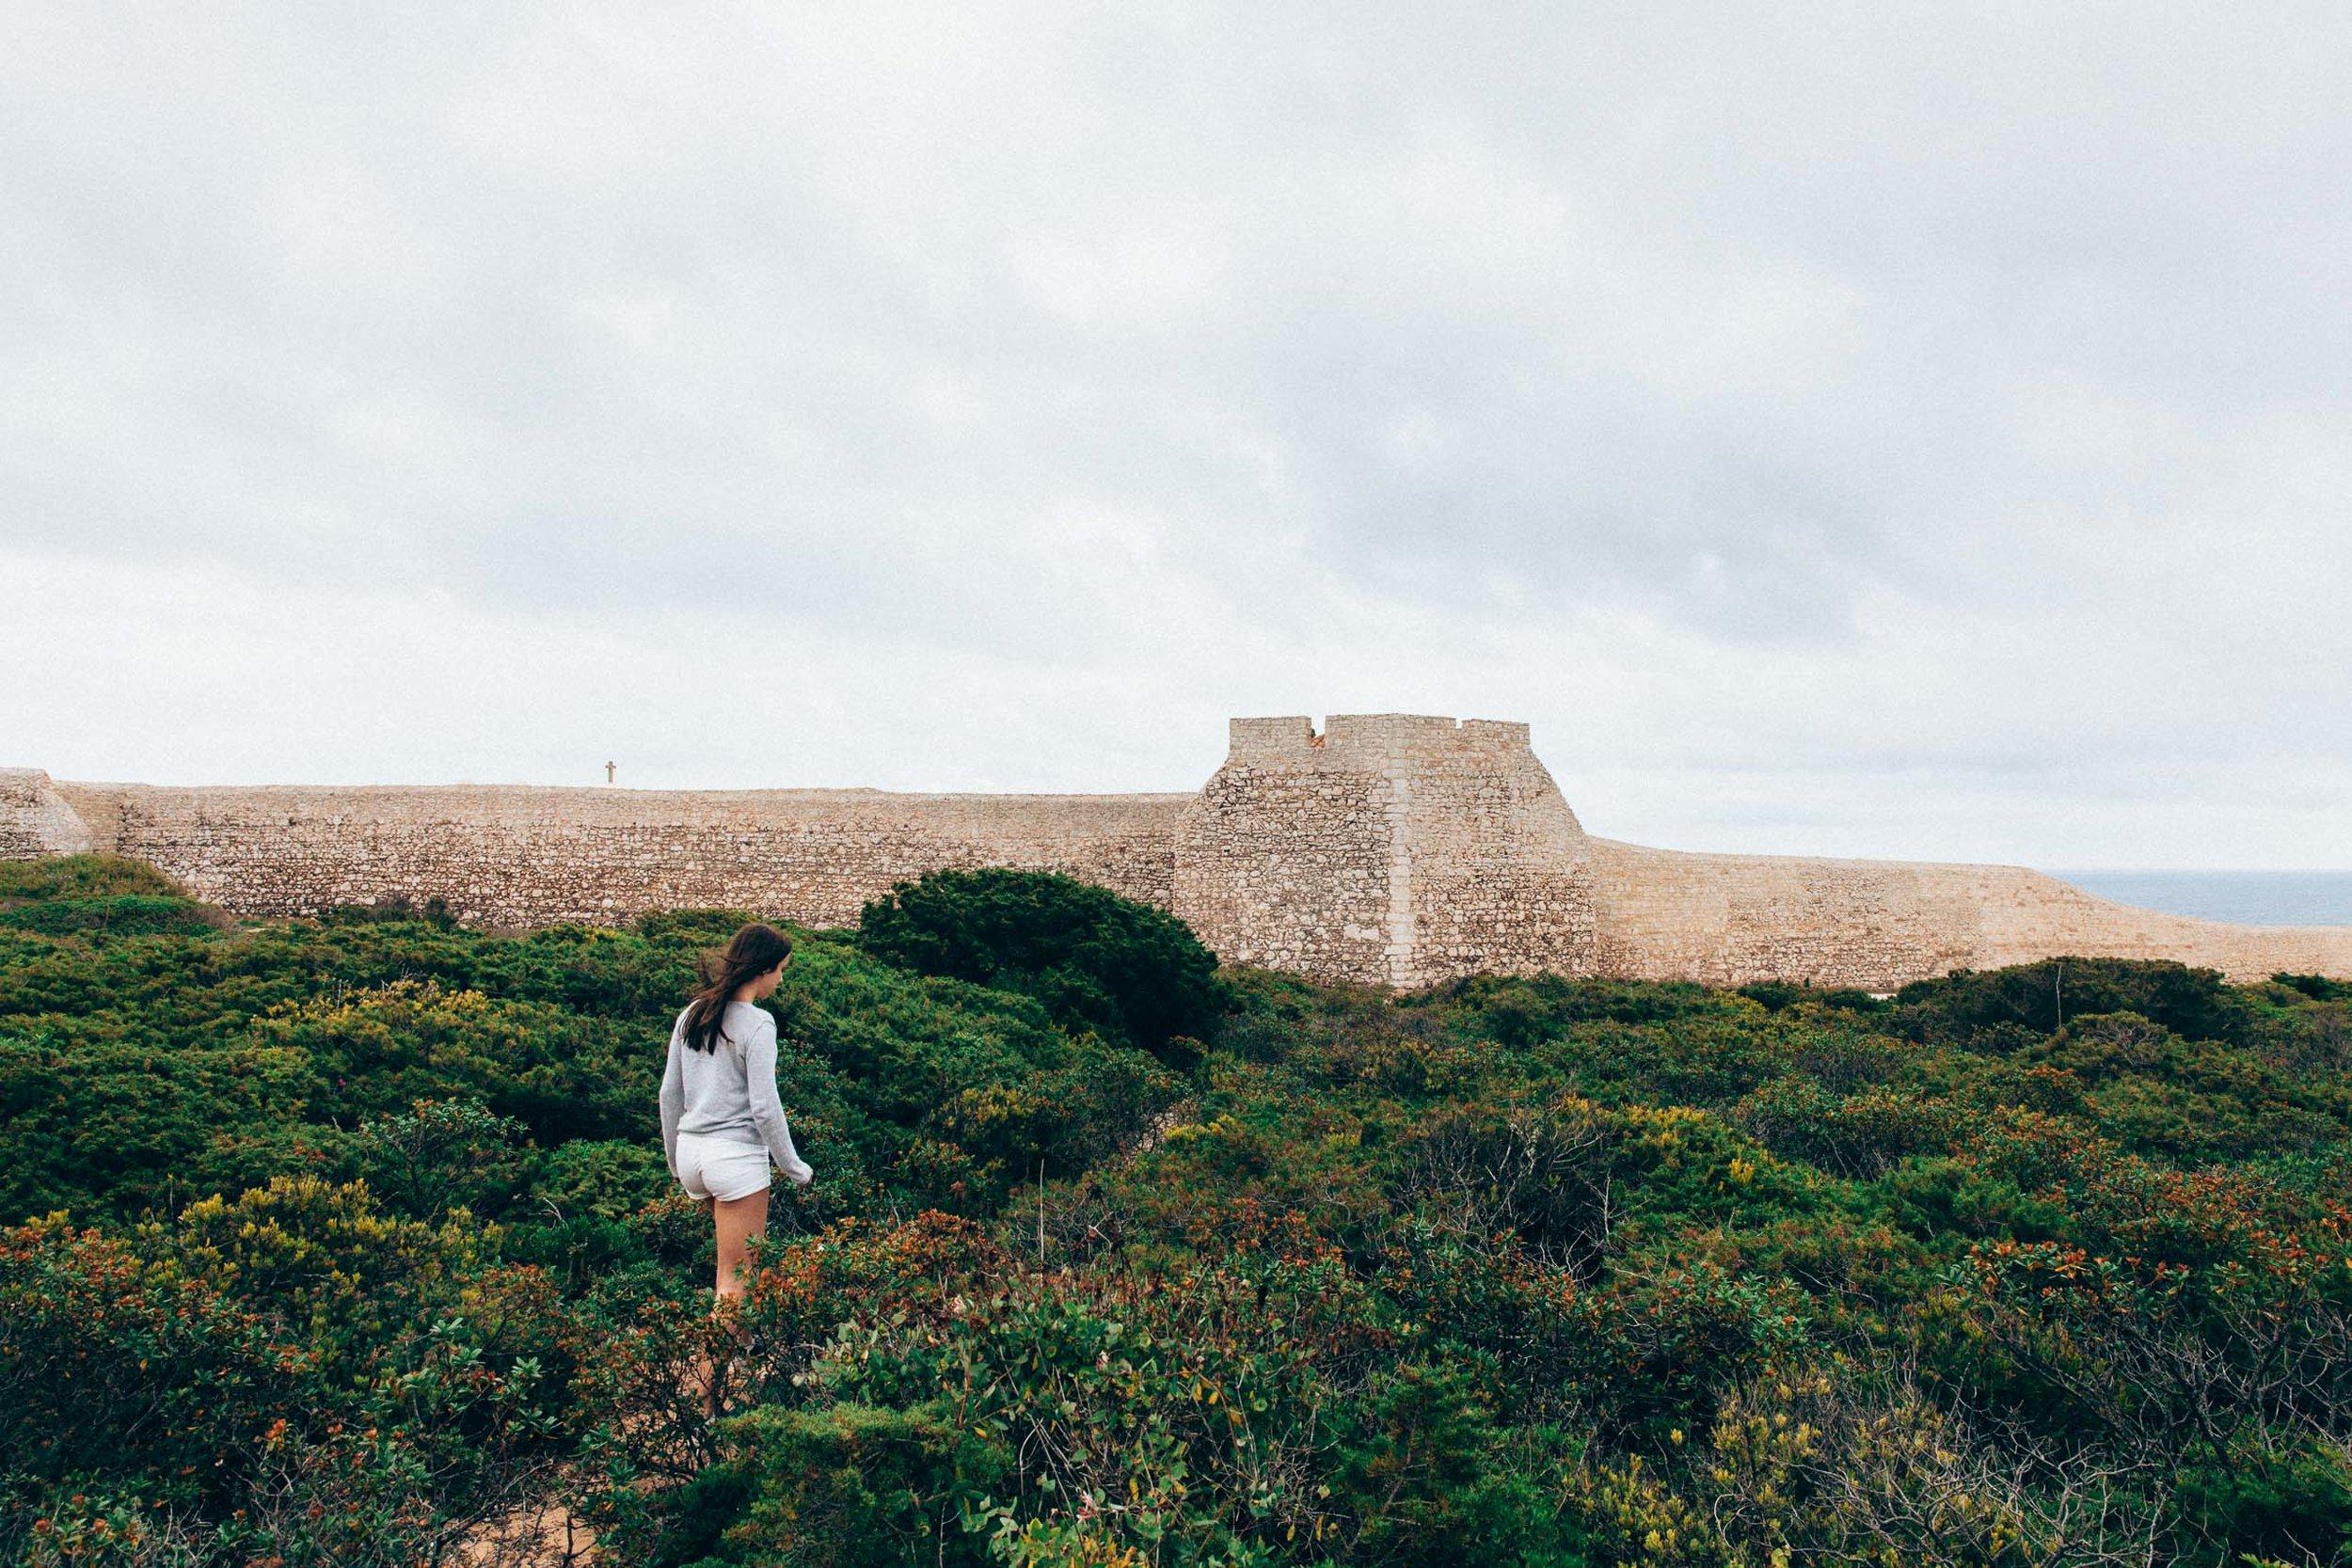 MaxHartmannphoto_Algarve2017-3009.jpg